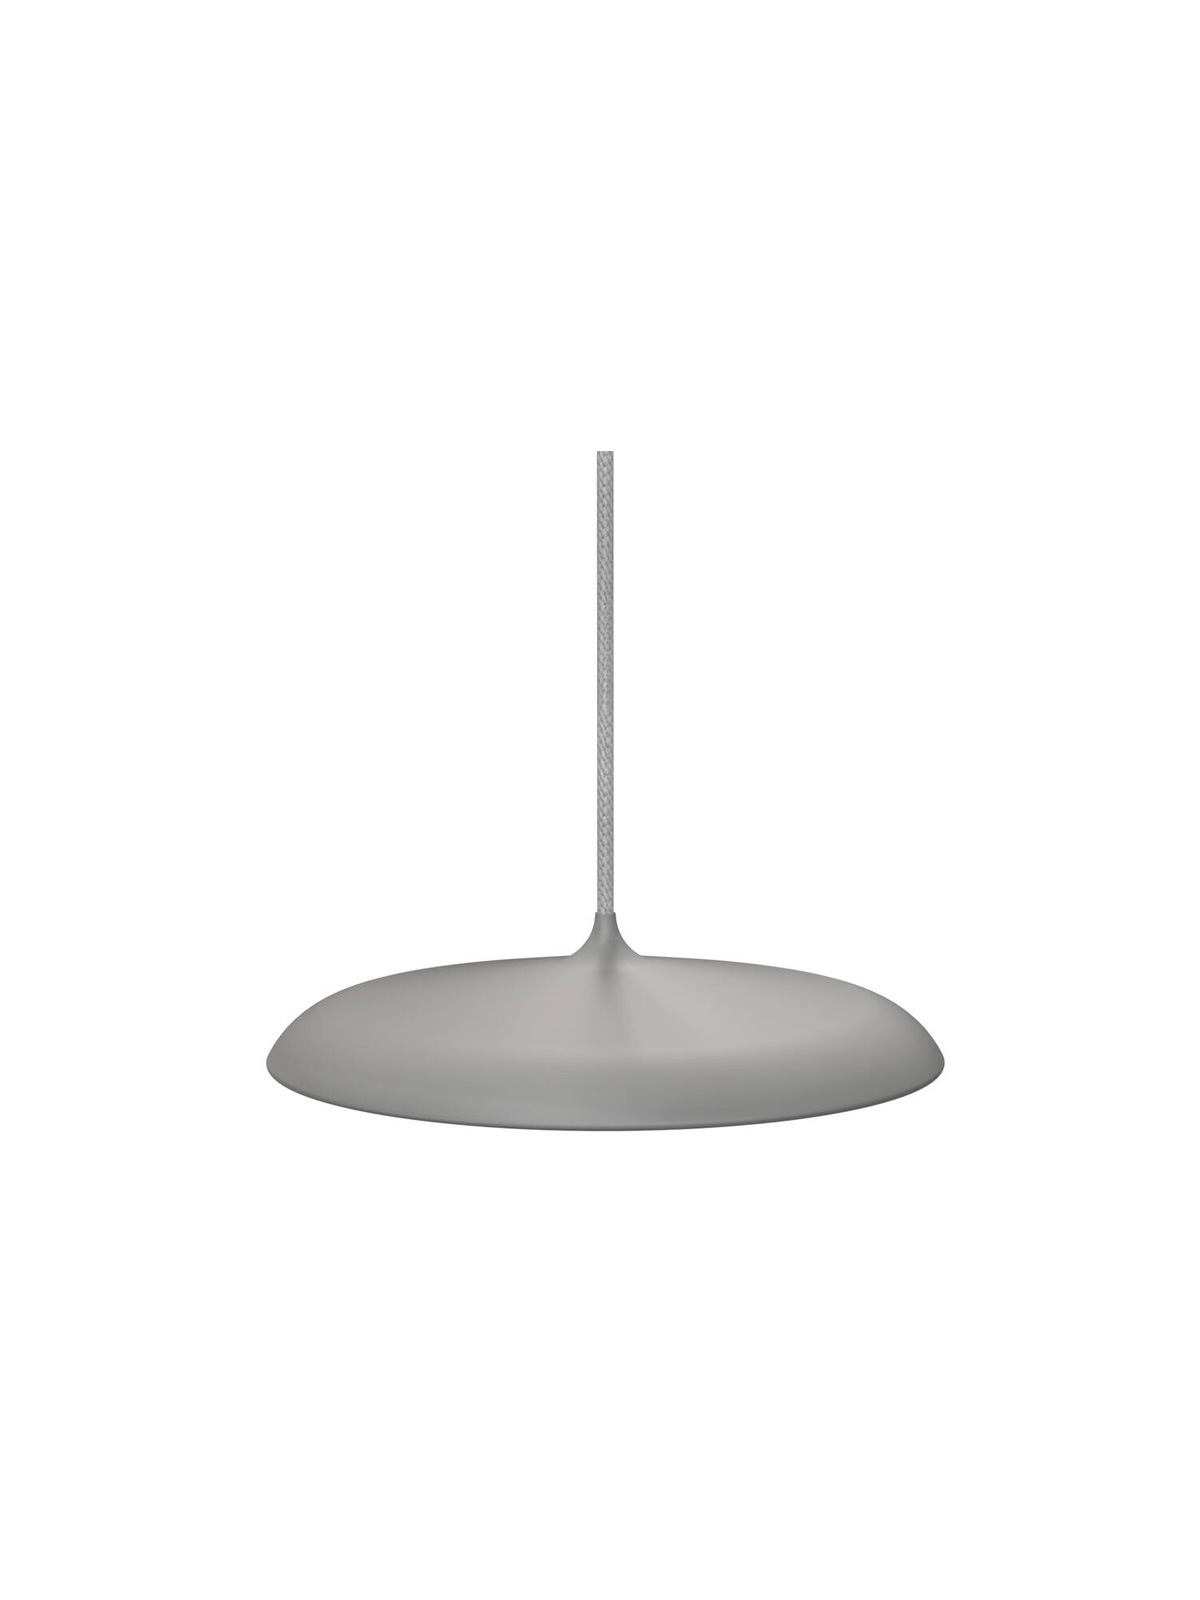 Design for the People Artist 25 Leuchte DesignOrt Onlineshop Lampen Berlin